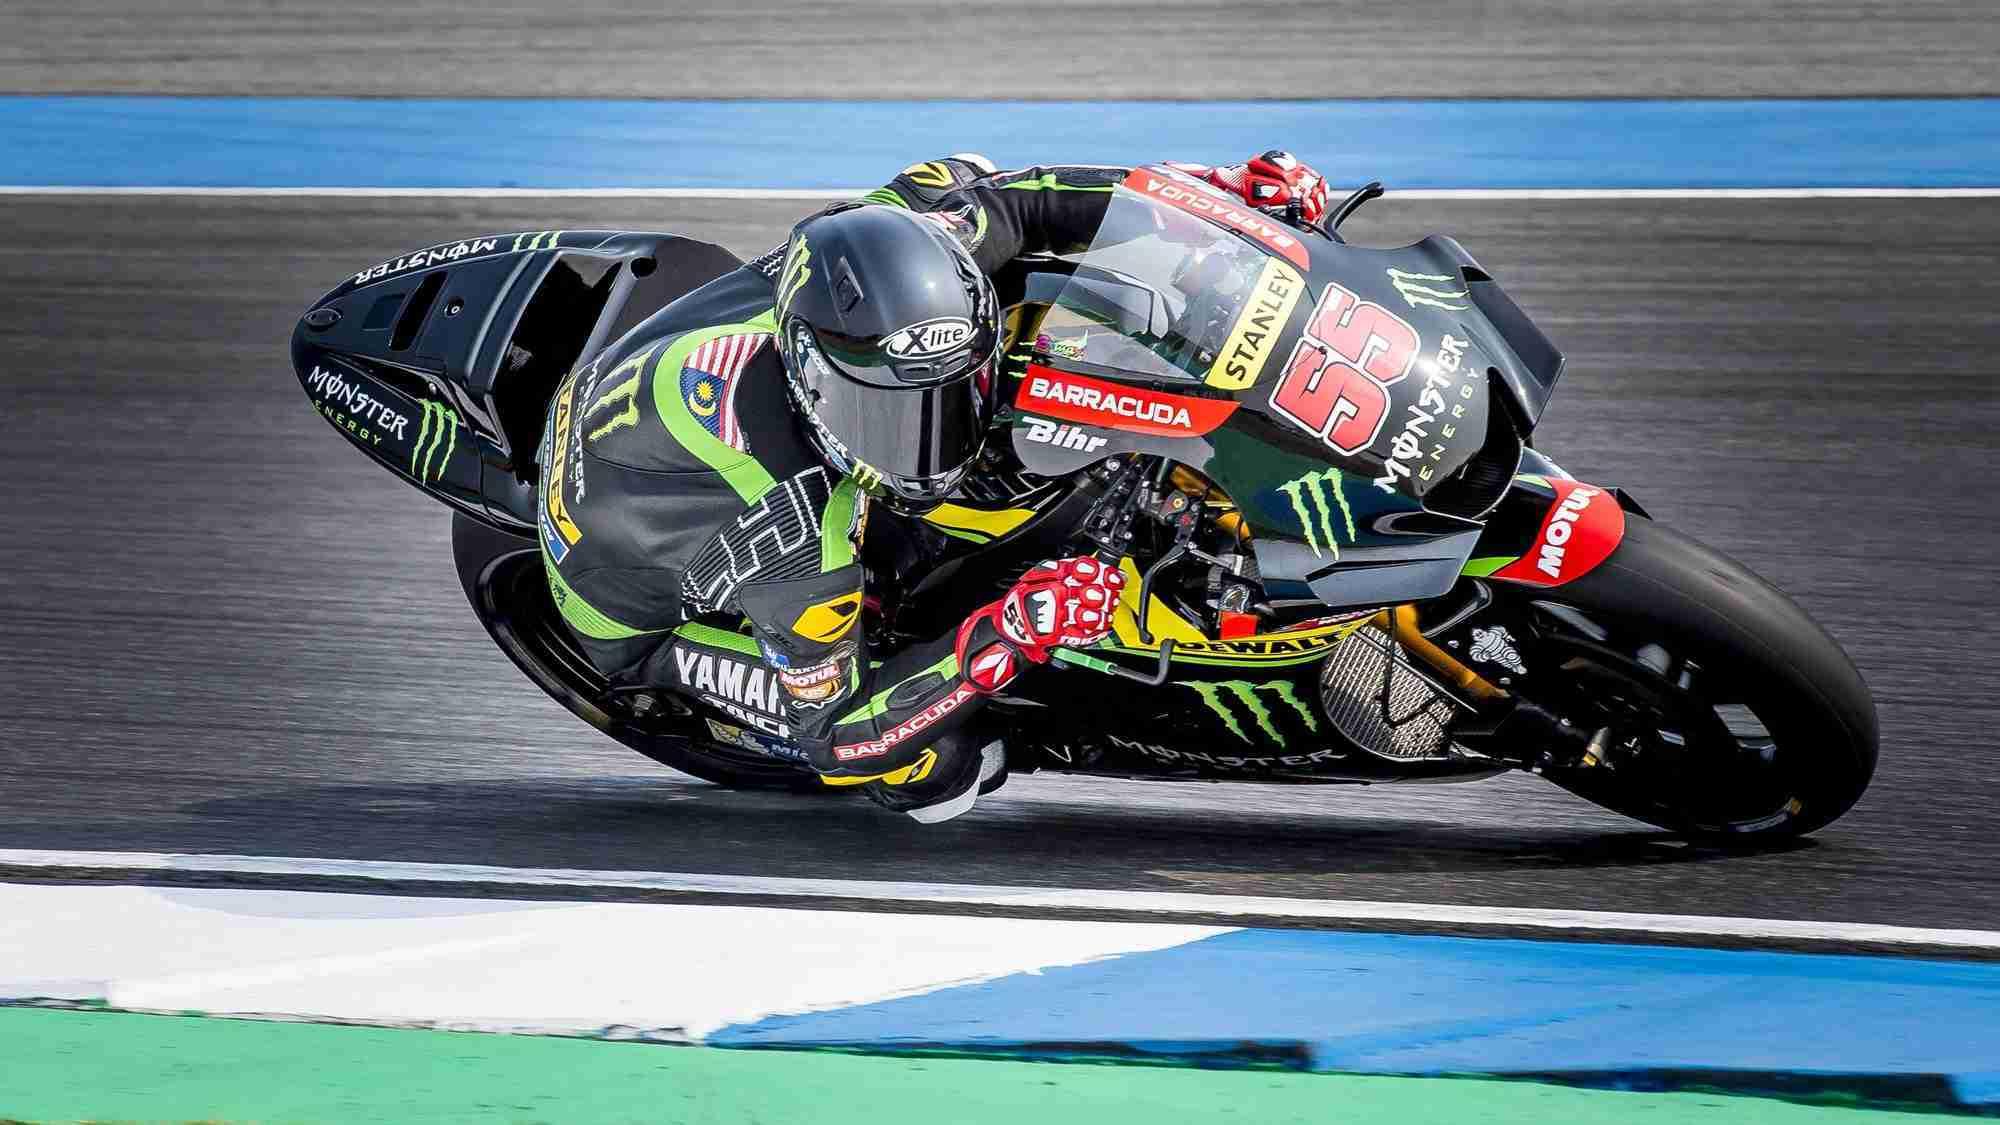 Hafizh Syahrin to ride for Tech3 Yamaha MotoGP team in 2018